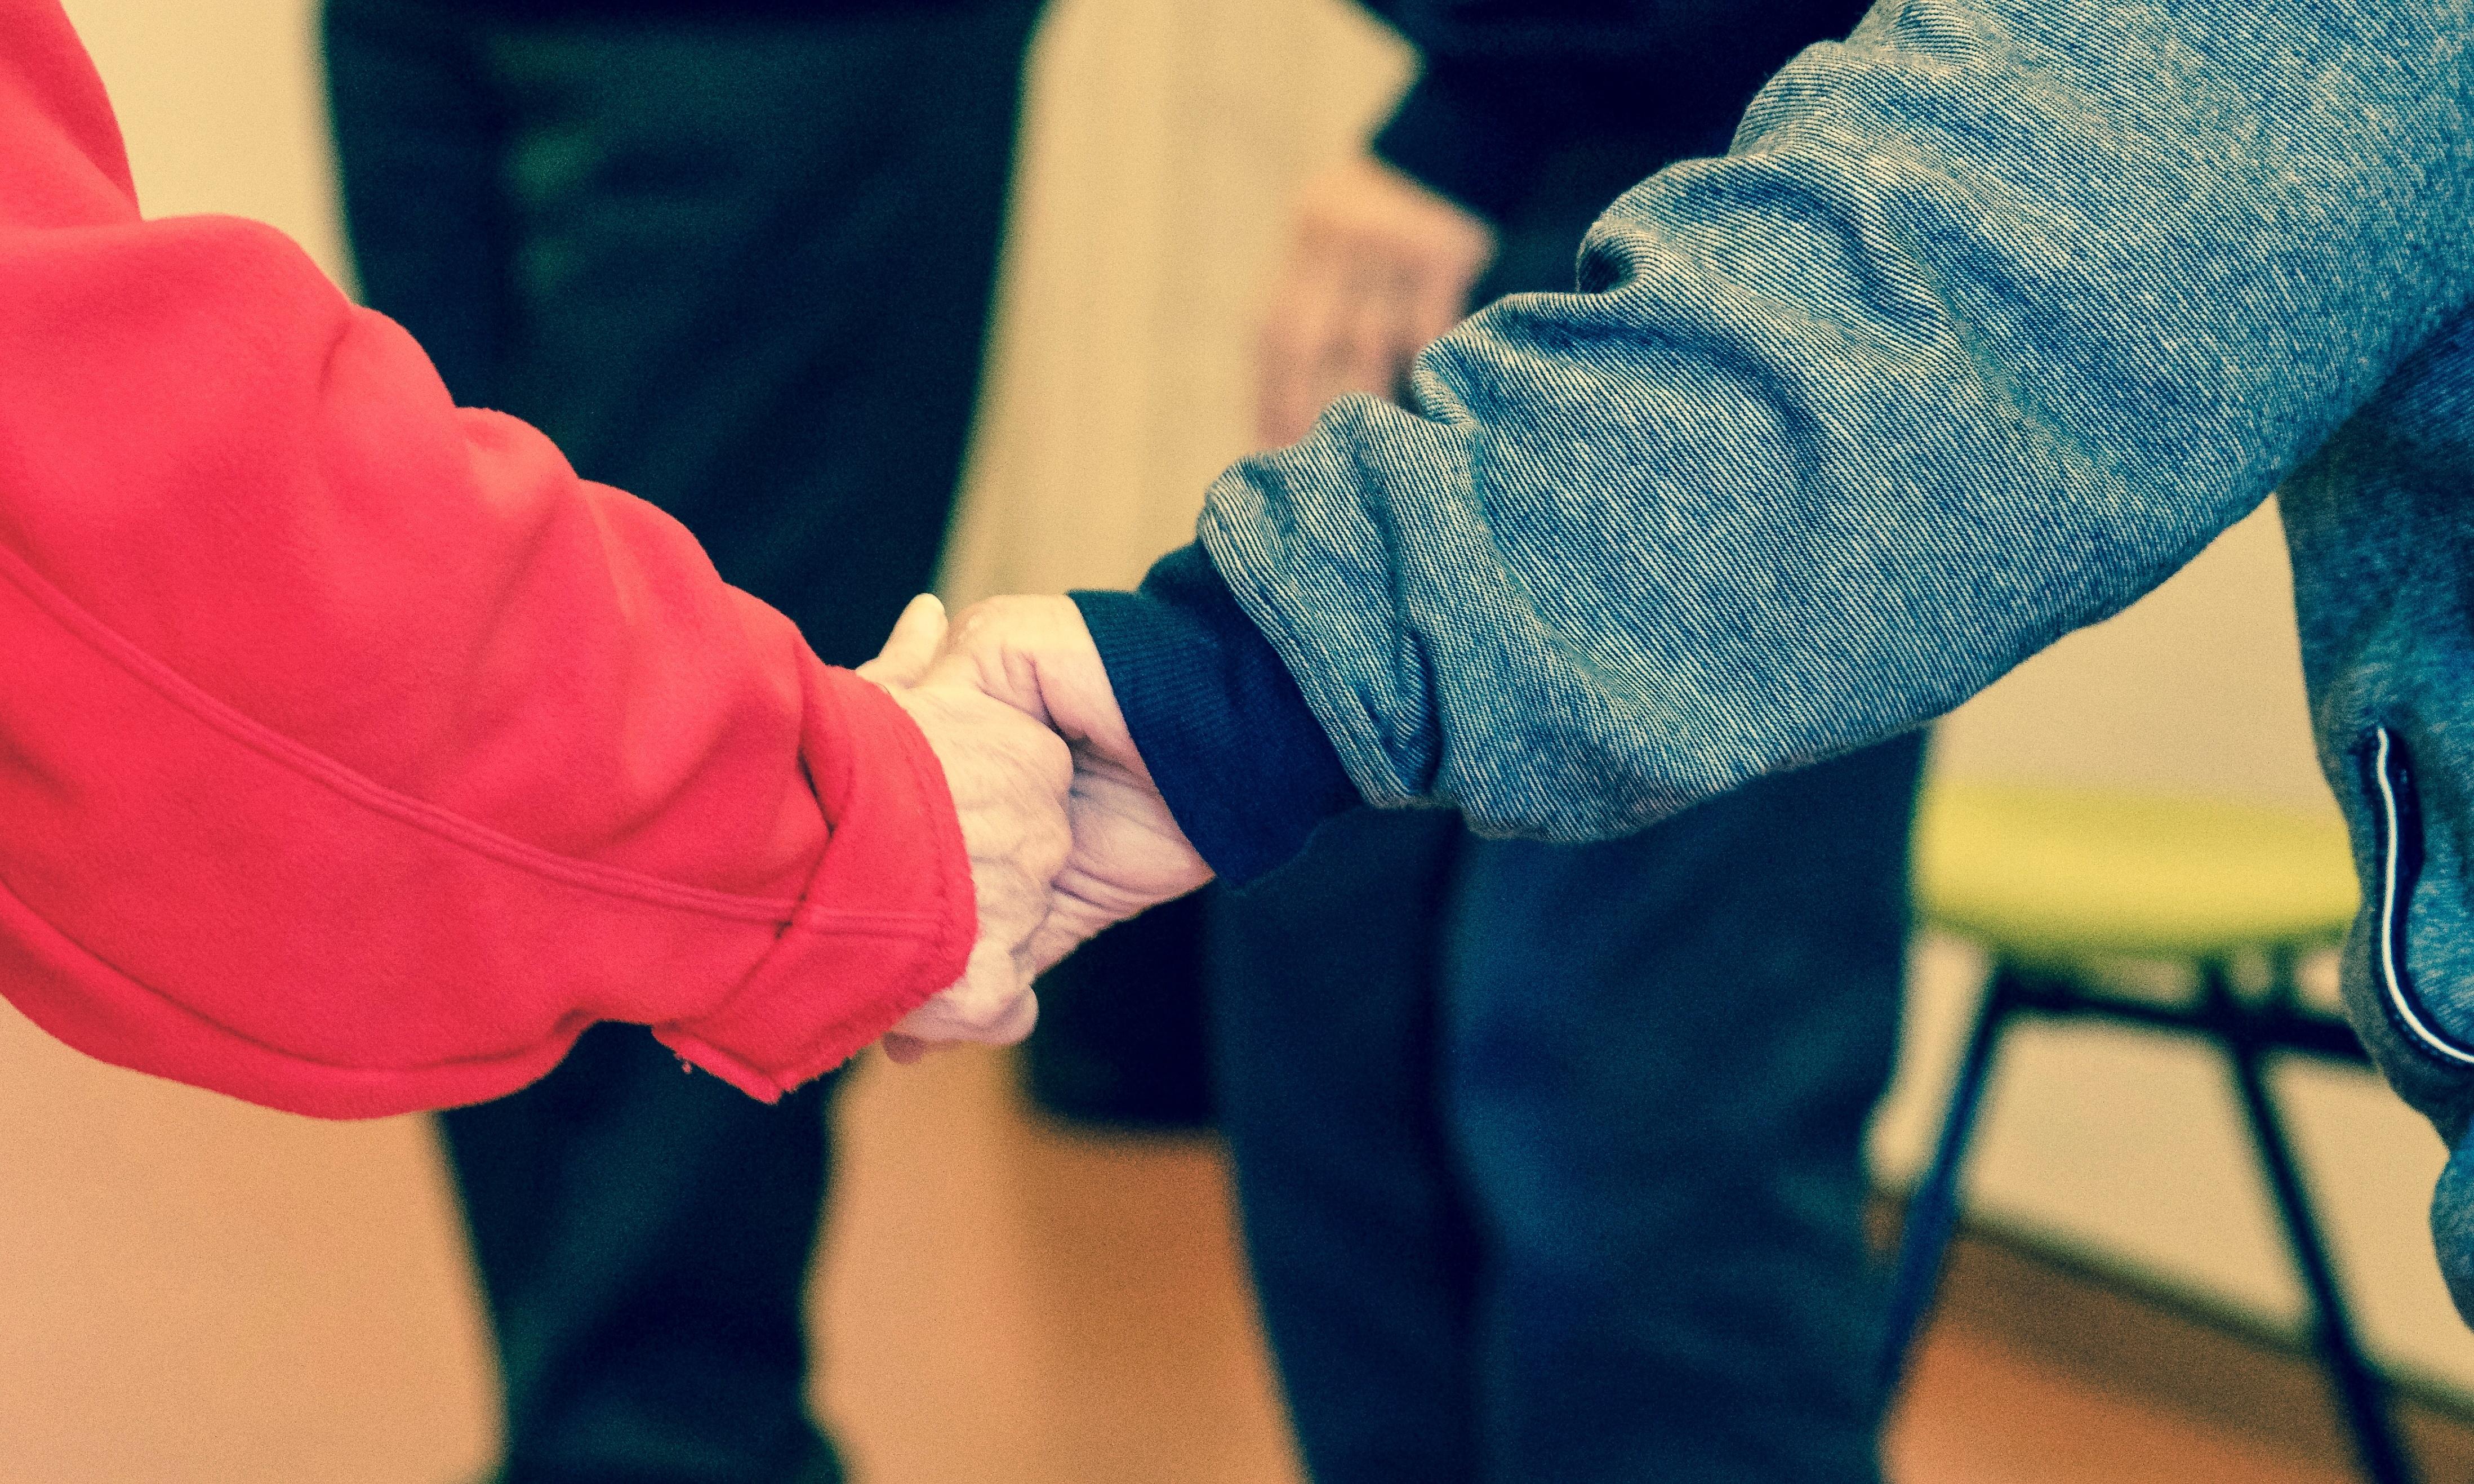 hand holding together friendship bond